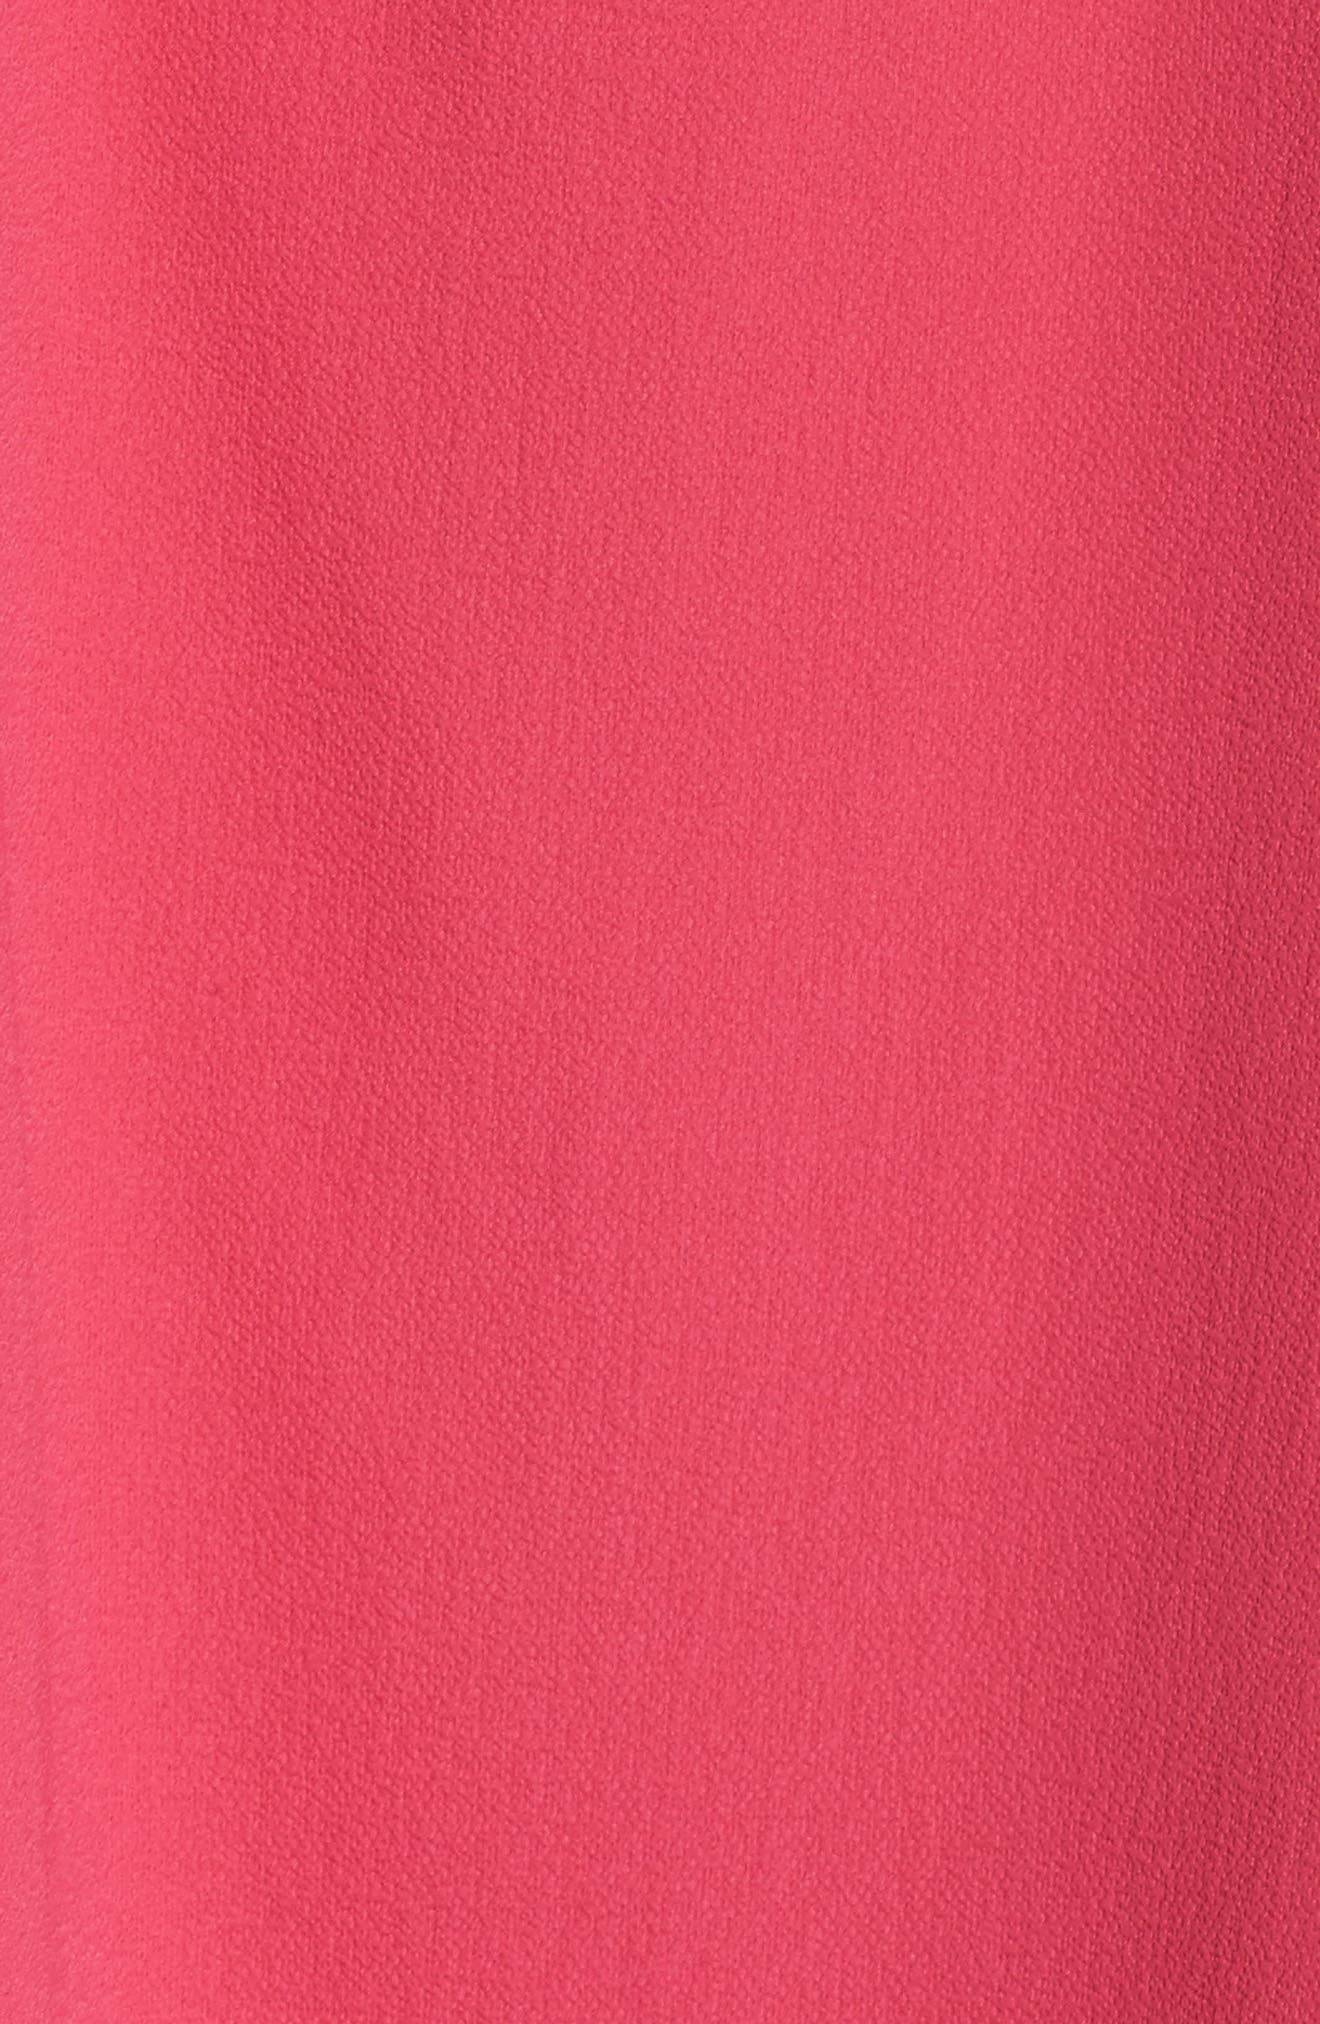 Off the Shoulder Ruffle Dress,                             Alternate thumbnail 39, color,